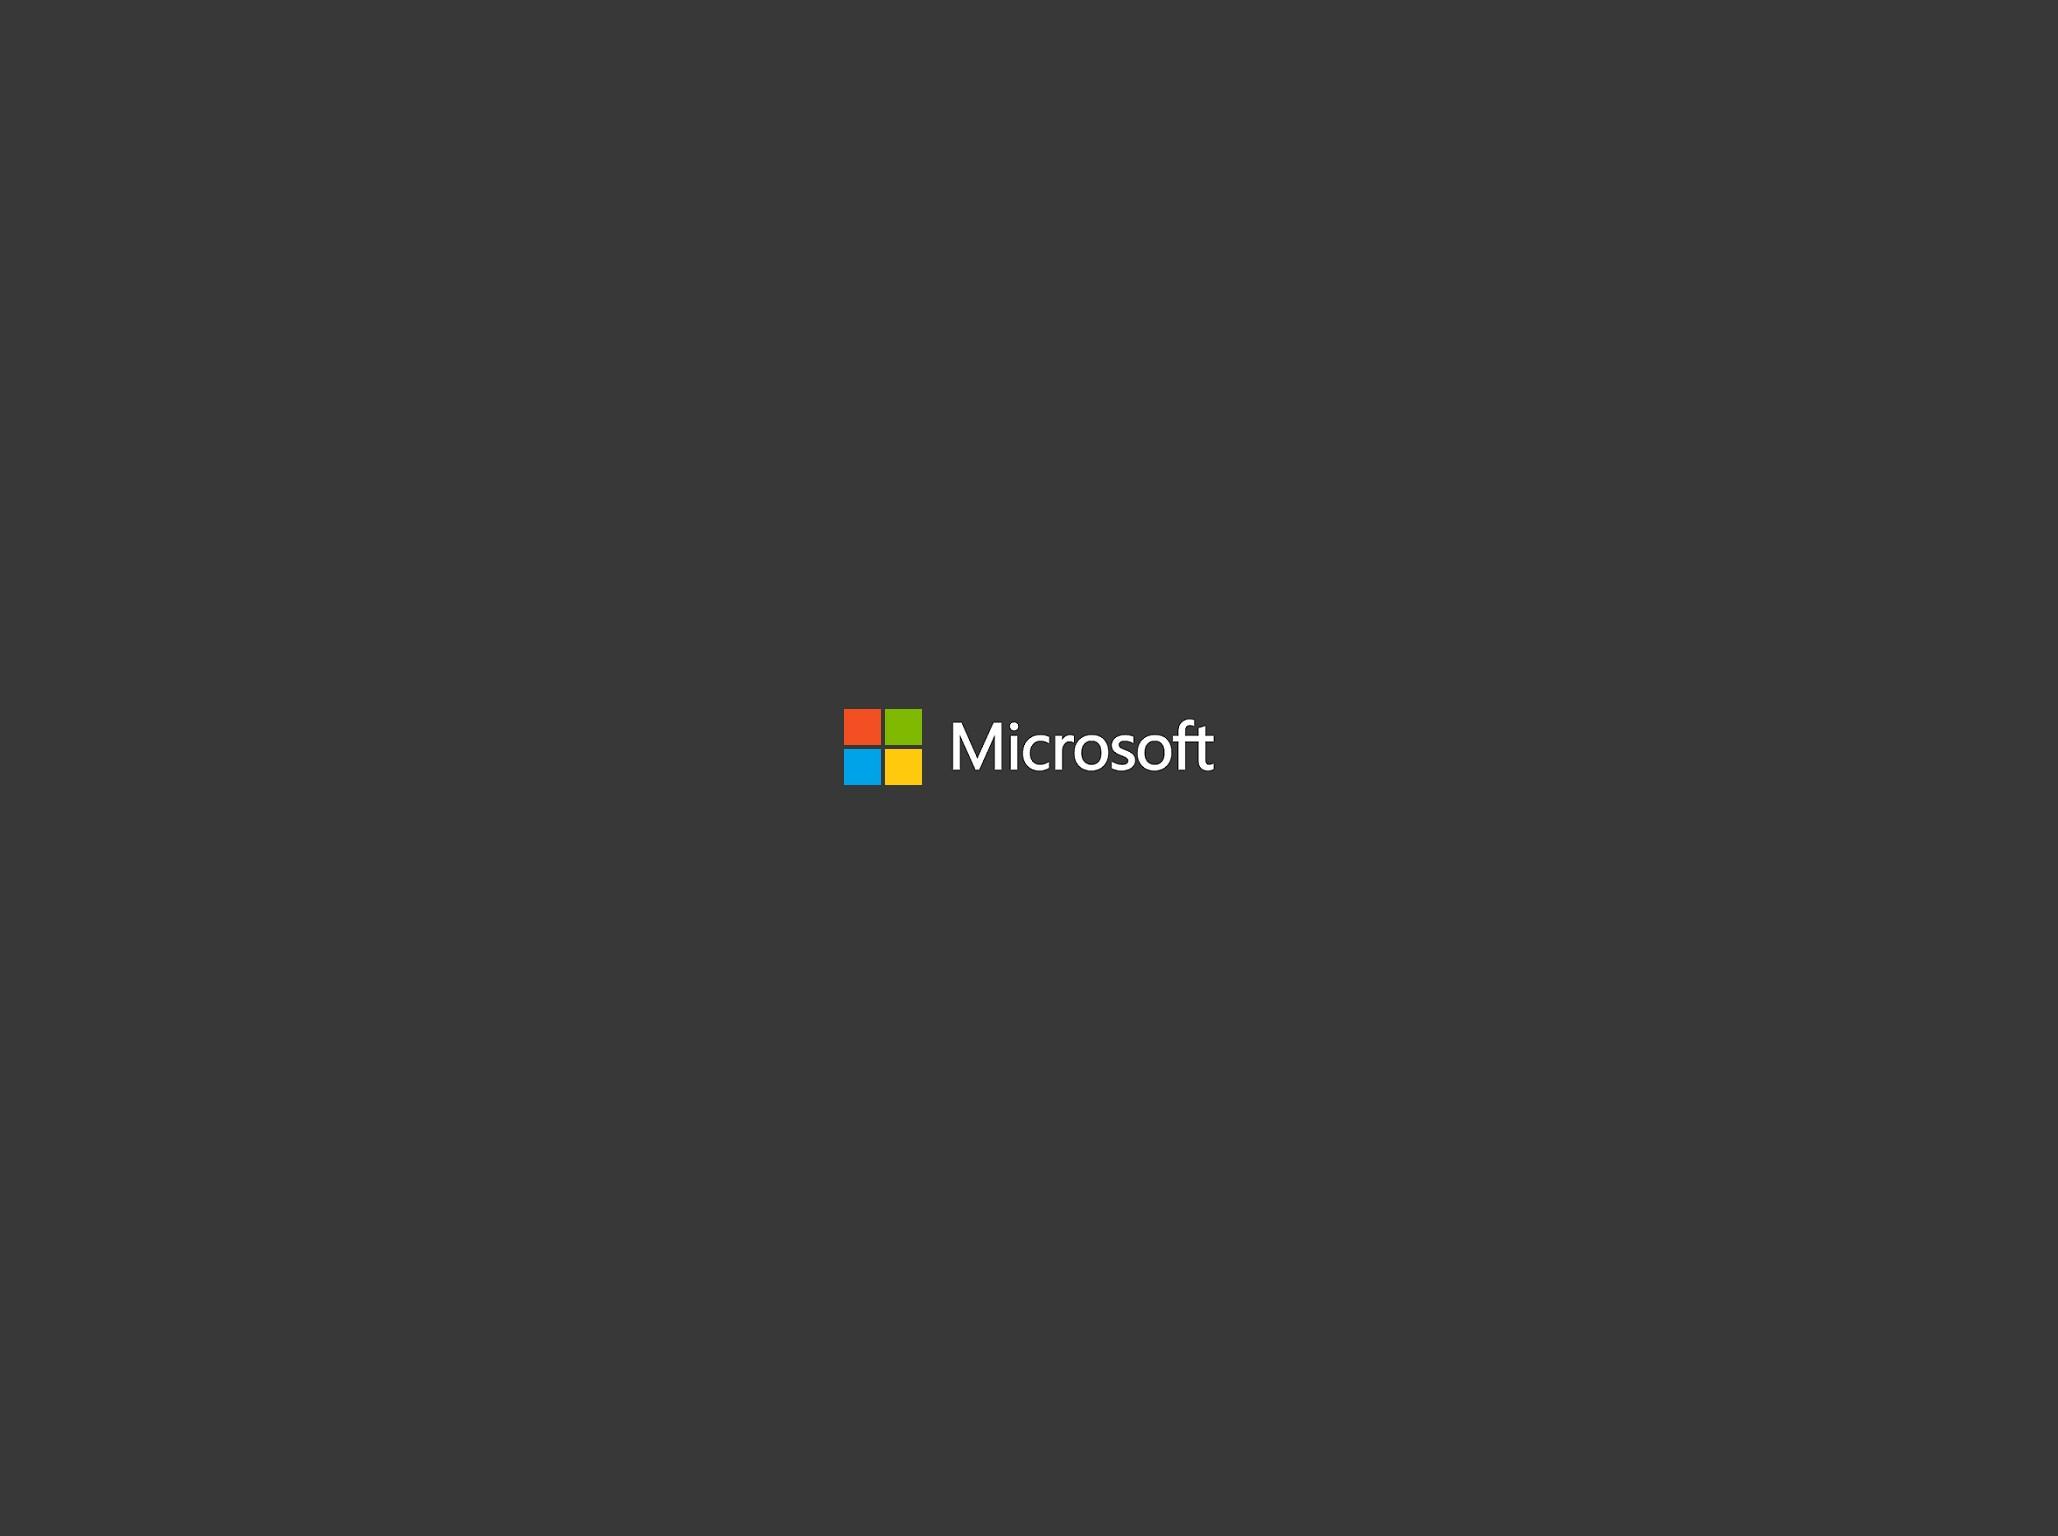 50 microsoft wallpapers download free beautiful high resolution wallpapers for desktop - Microsoft wallpaper ...